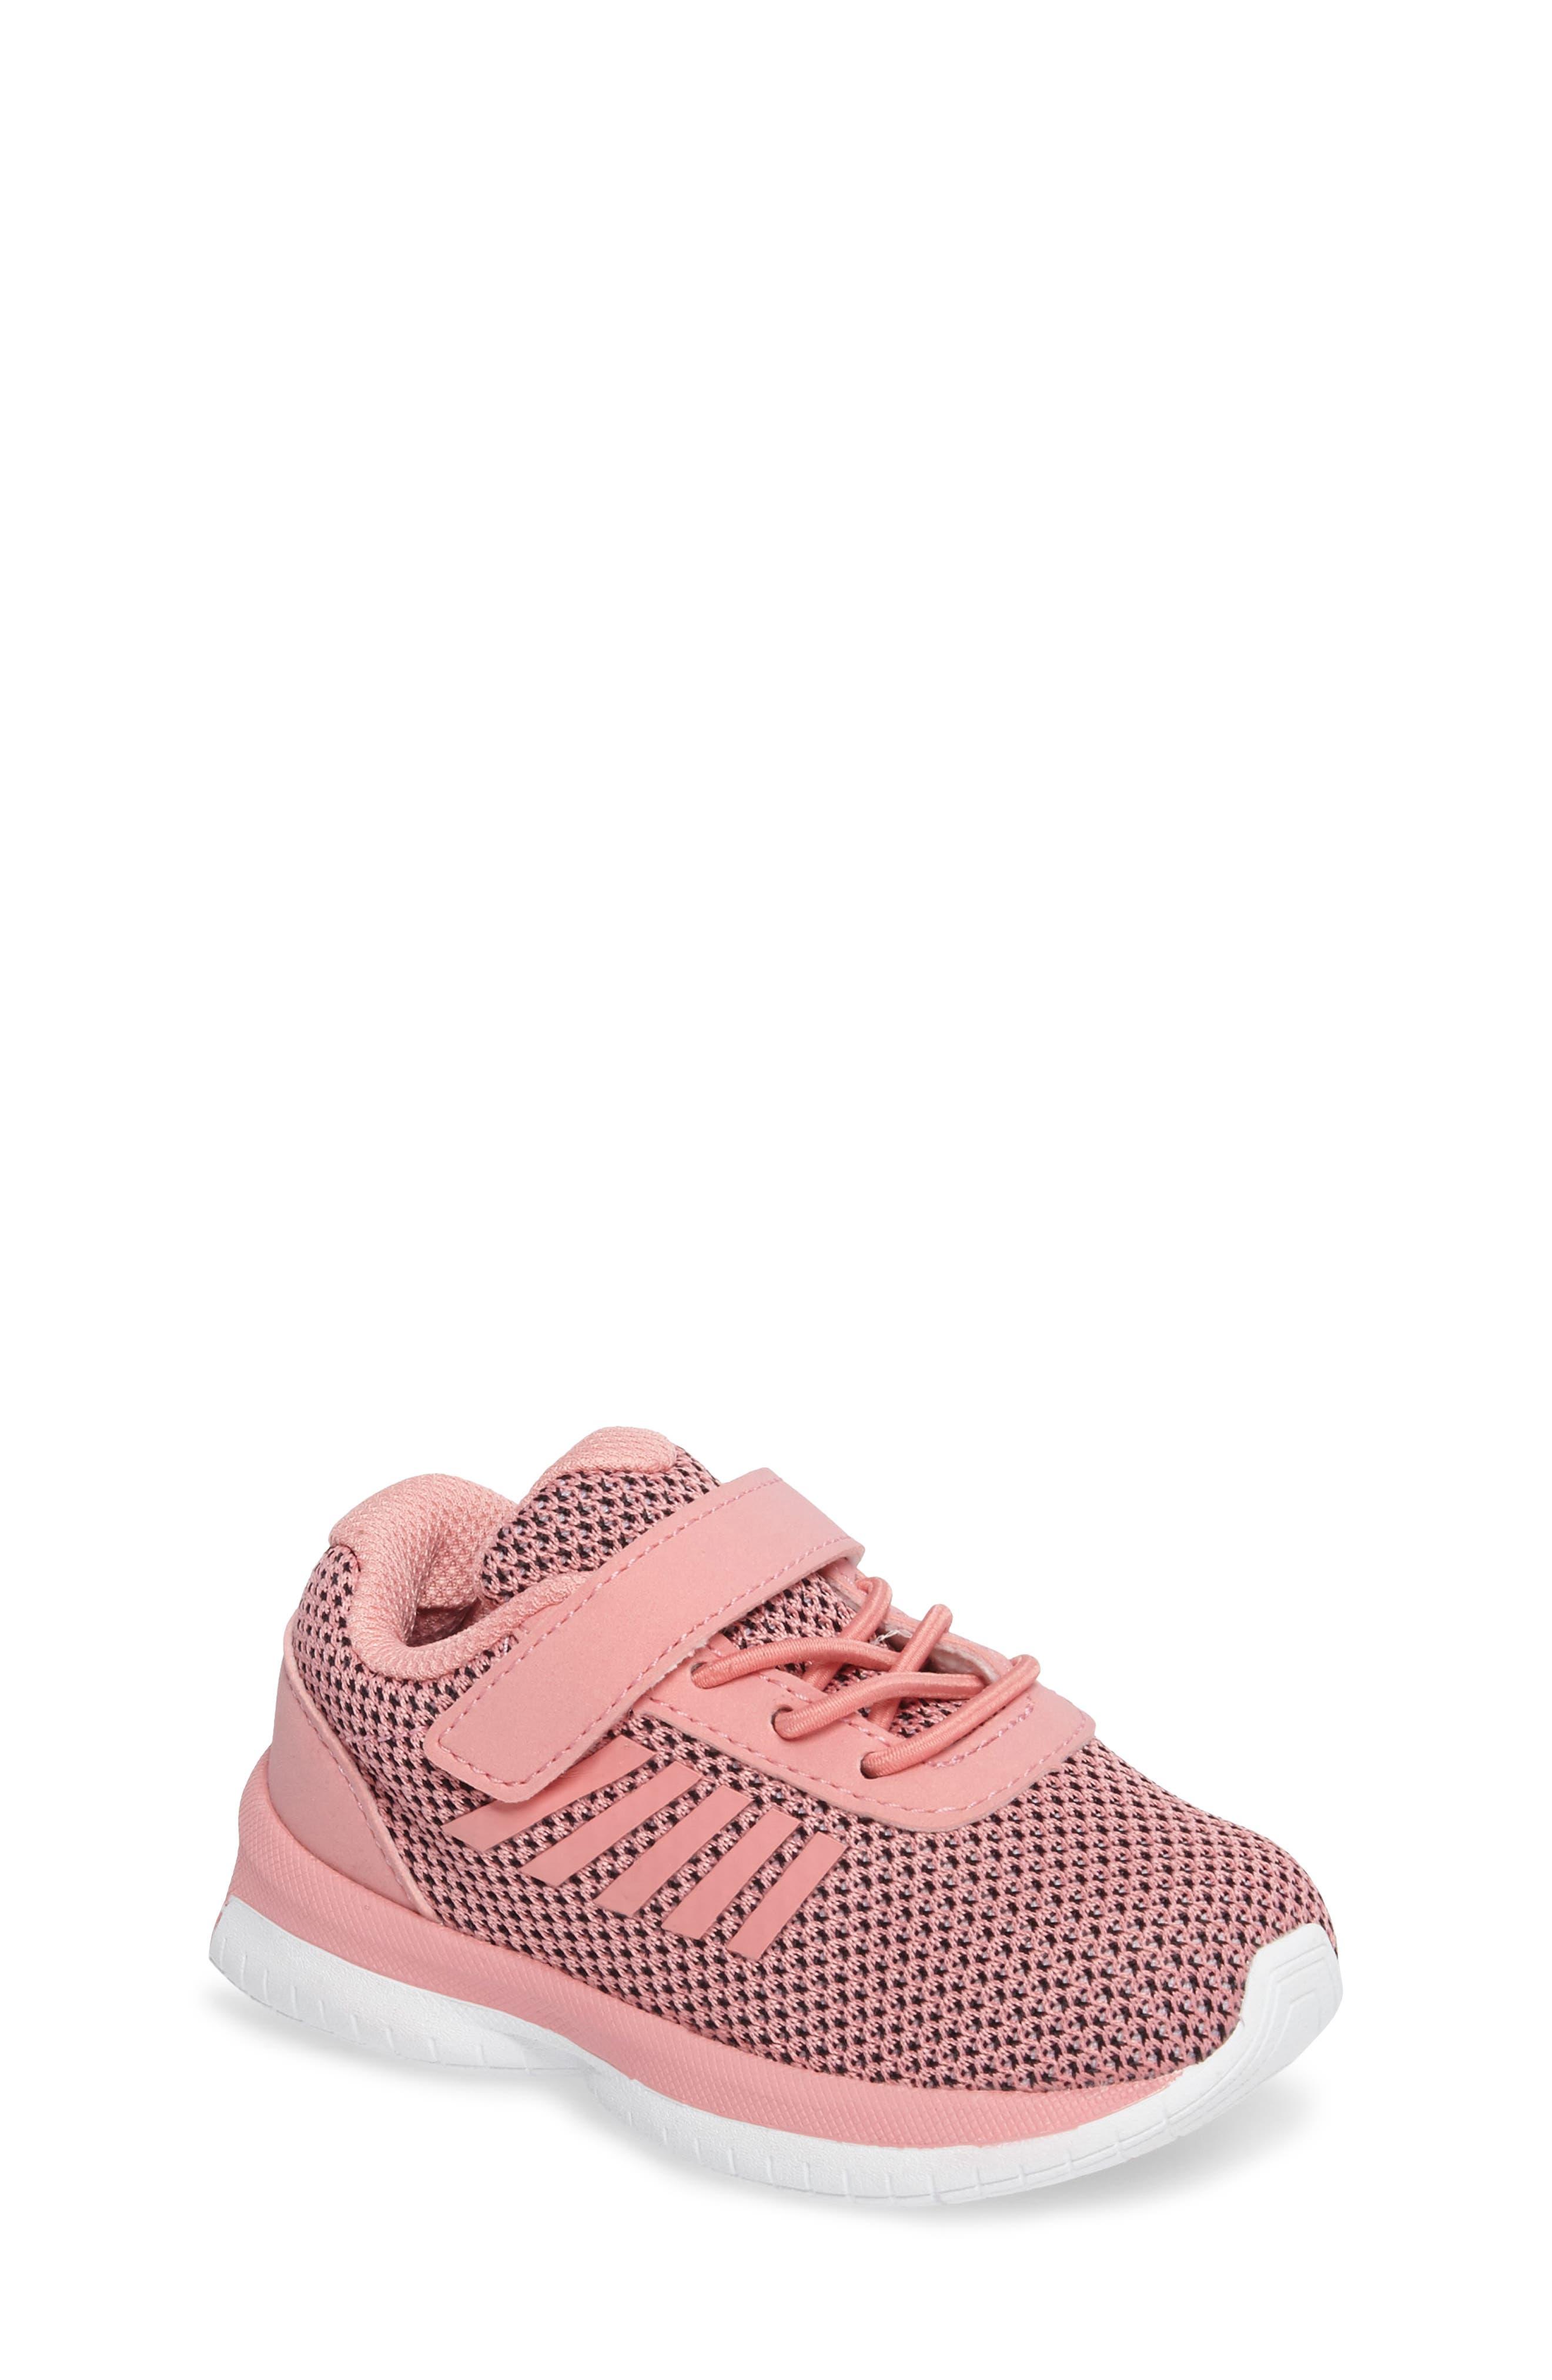 Tubes Infinity Sneaker,                             Main thumbnail 1, color,                             Flamingo Pink/ White